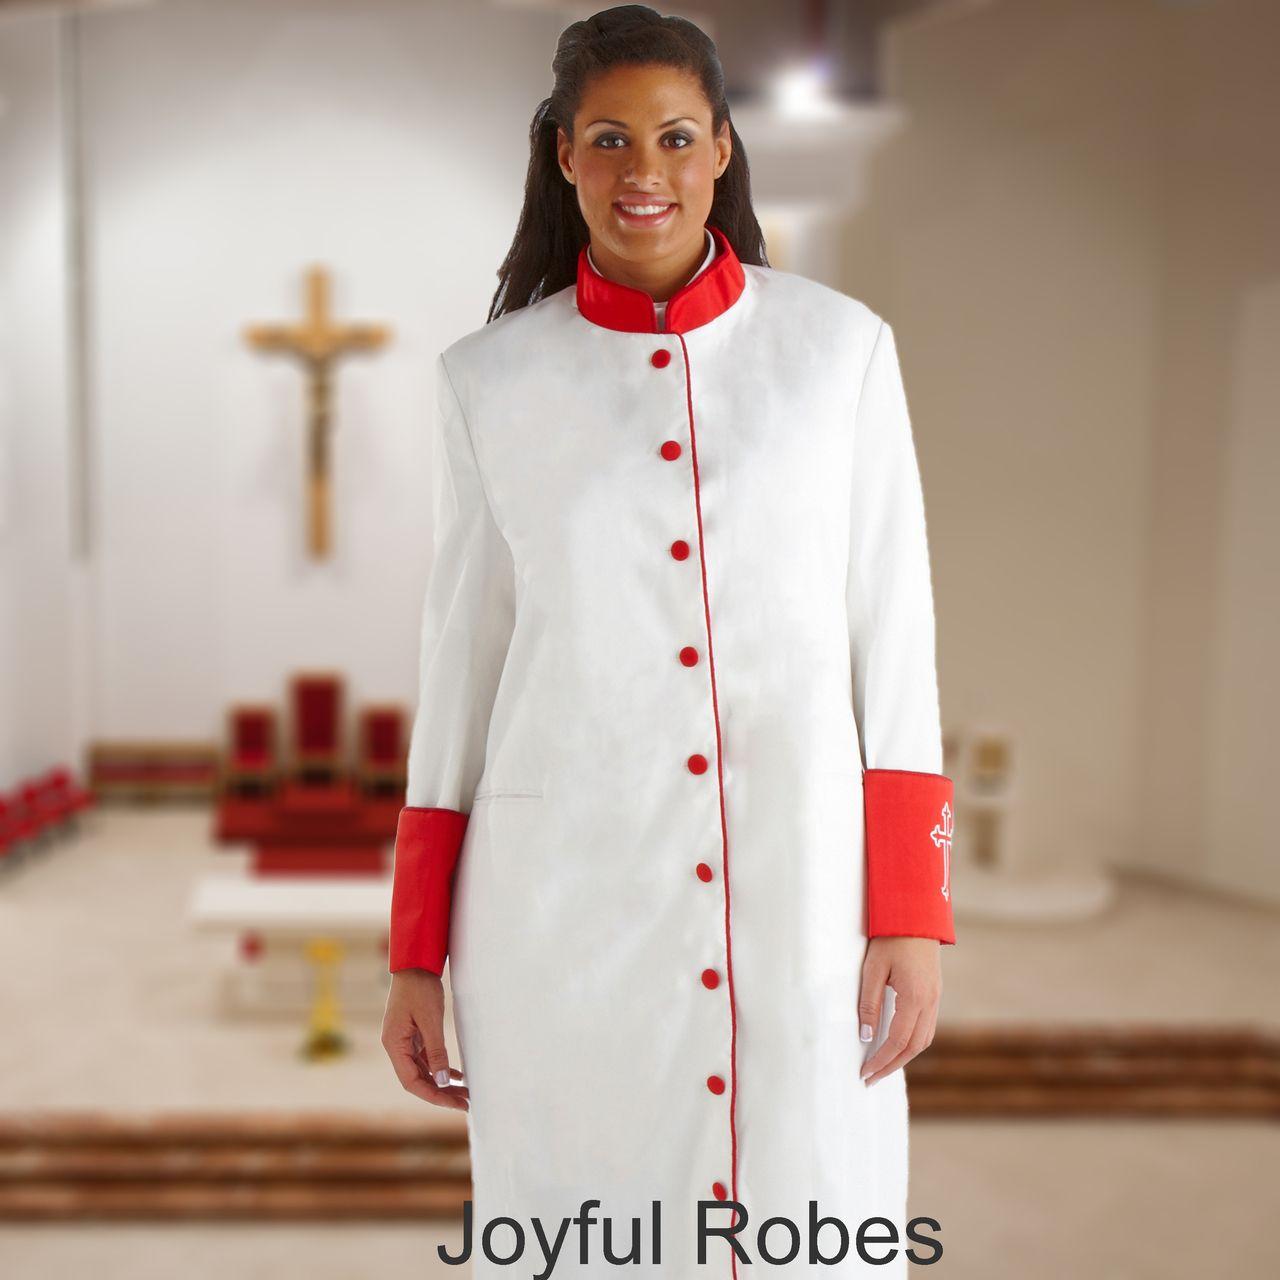 311 W. Women's Clergy/Pastor Robe - White/Red Cuff